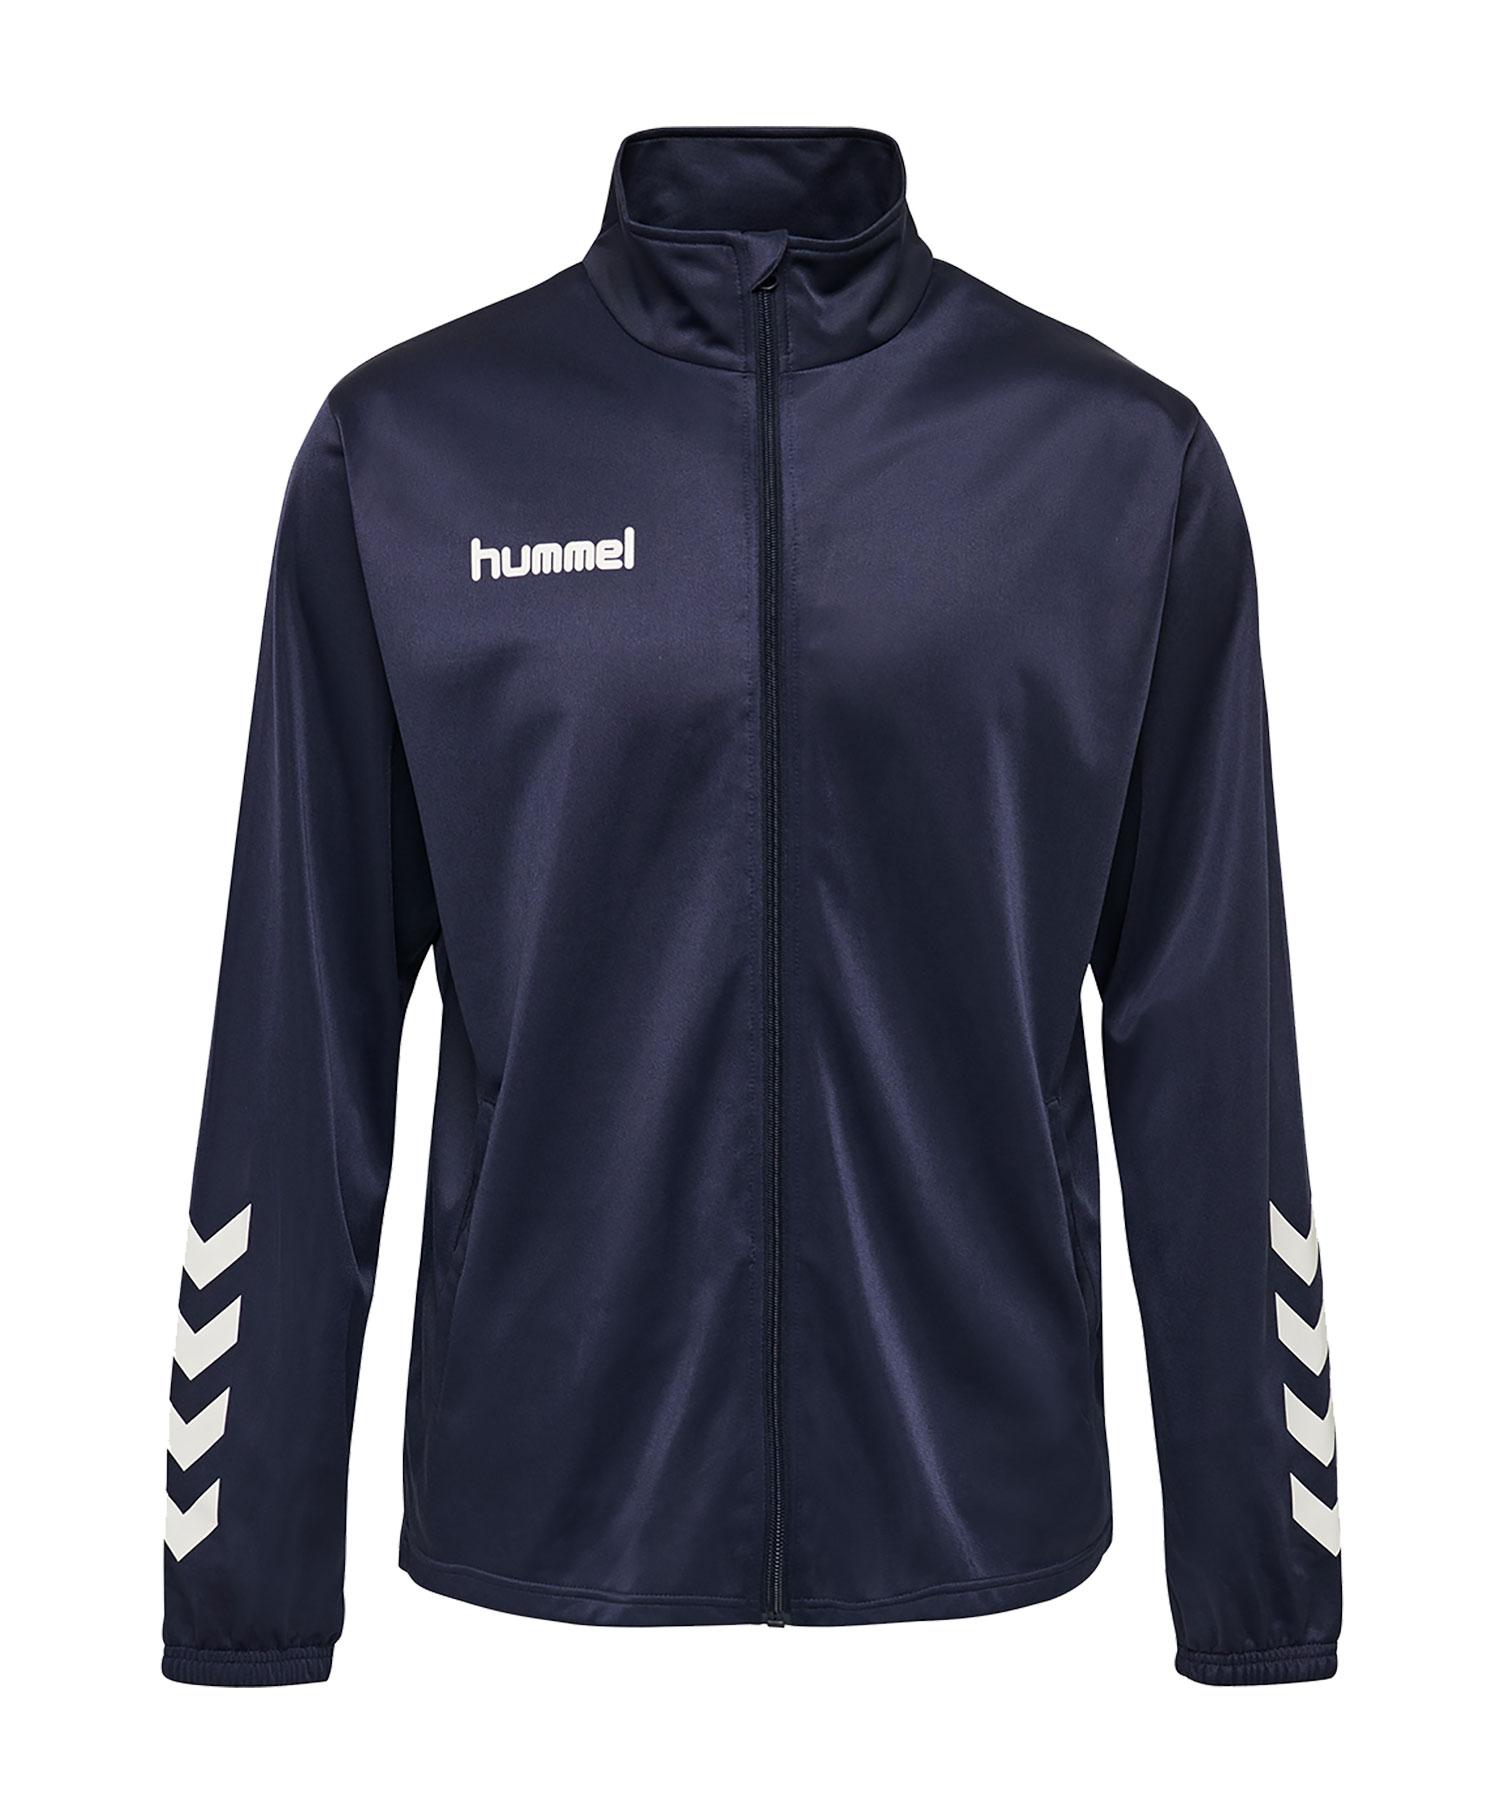 Hummel Promo Tracksuit